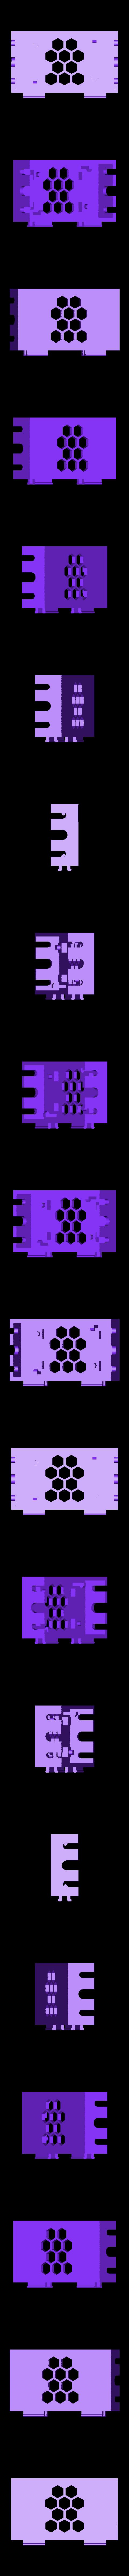 Base-v2.stl Download free STL file LM2596 and LM2596S Buck converter tool-less snap-fit enclosure - Ender, CR-10, 2020 • 3D printer template, FedorSosnin